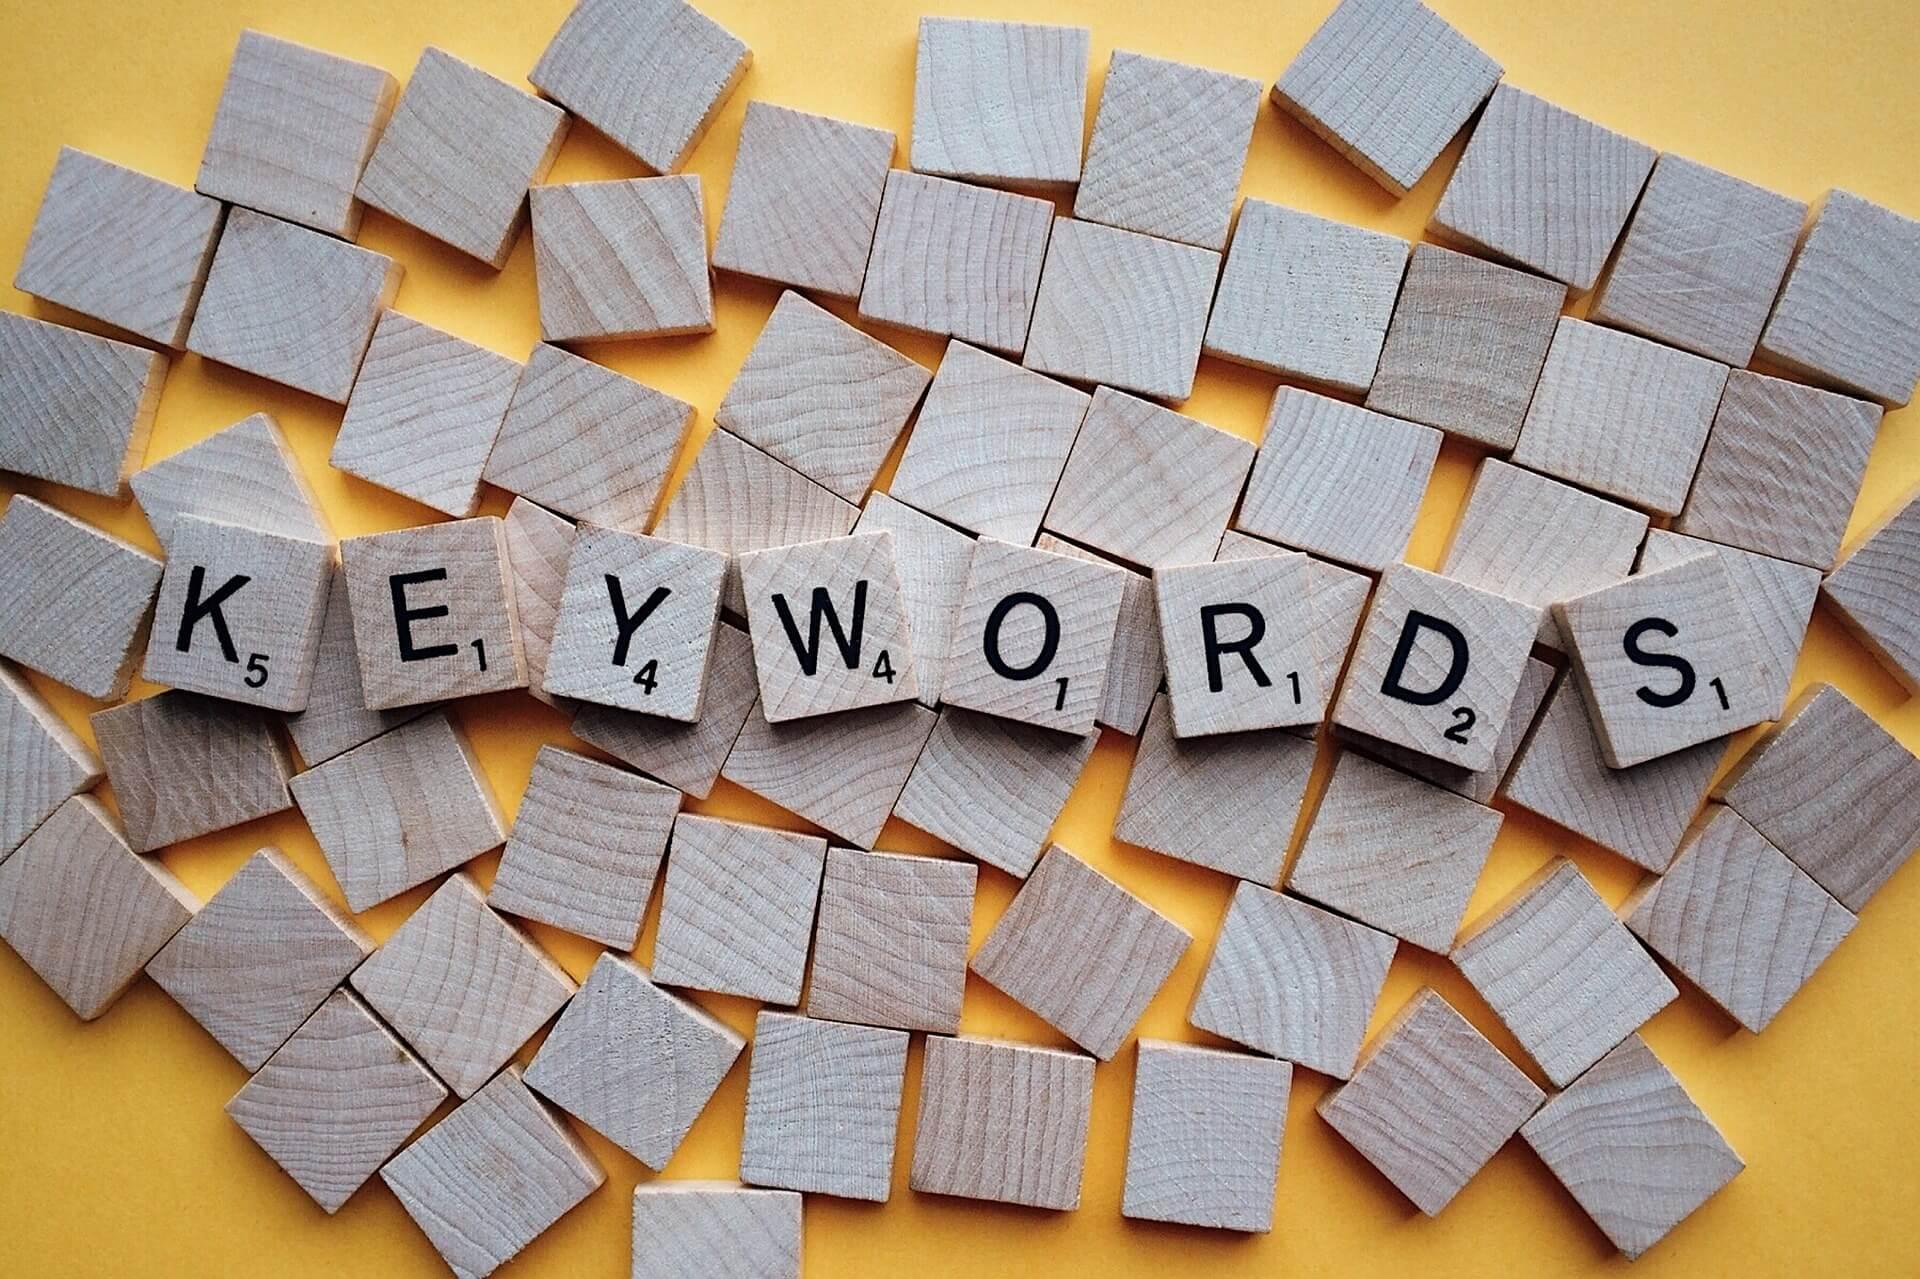 Optimizing for Long-Tail Keywords